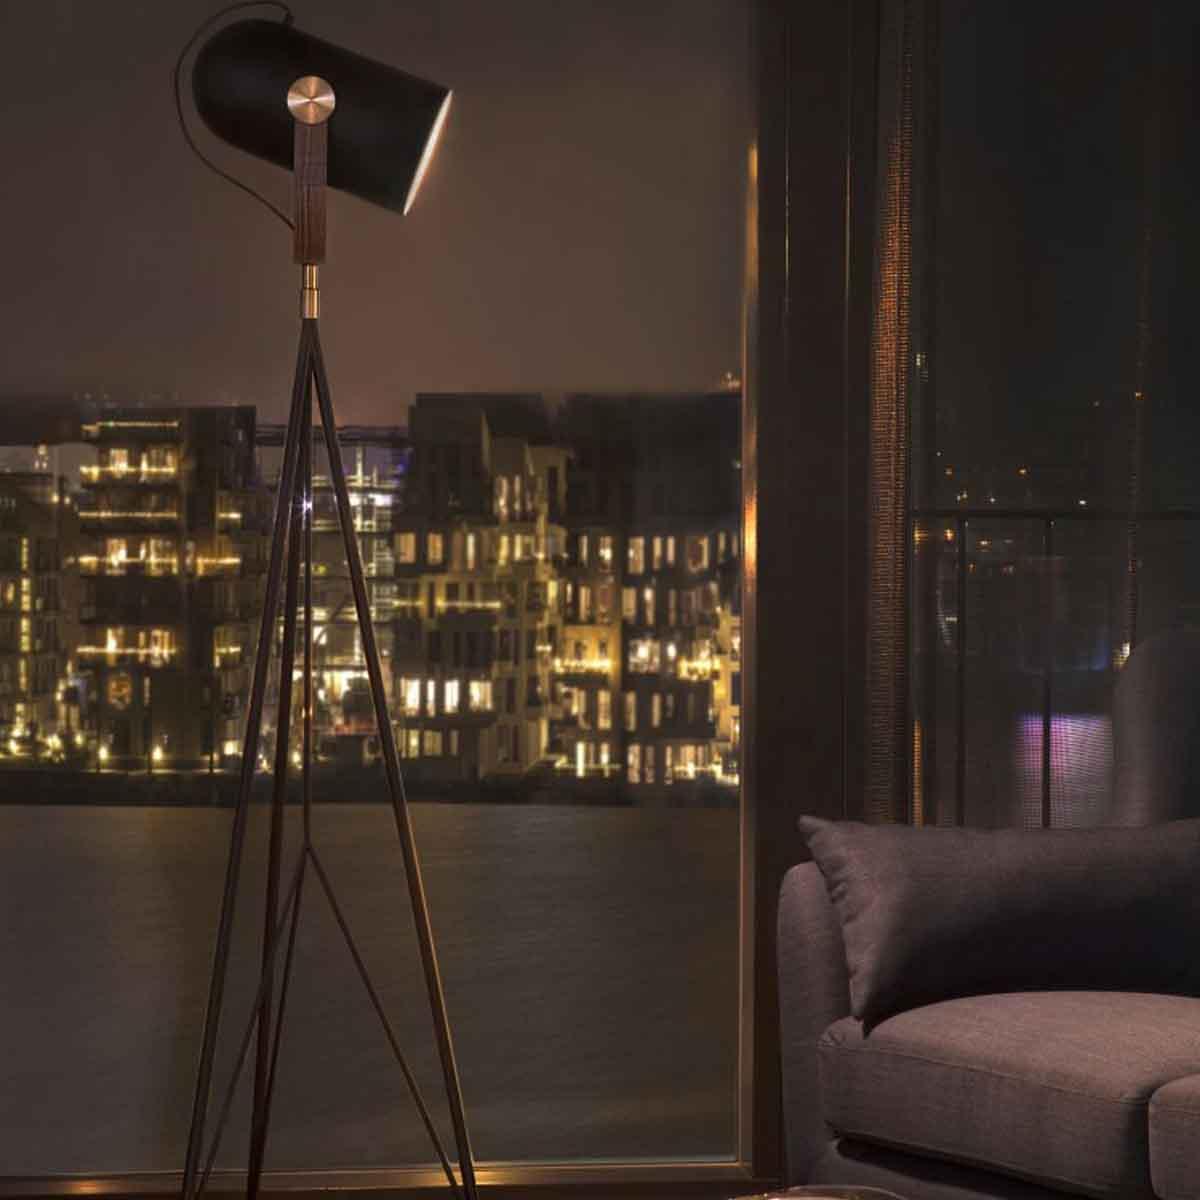 le klint stehleuchte carronade high schwarz h he 170 175 cm m bel lampen leuchten stehlampen. Black Bedroom Furniture Sets. Home Design Ideas